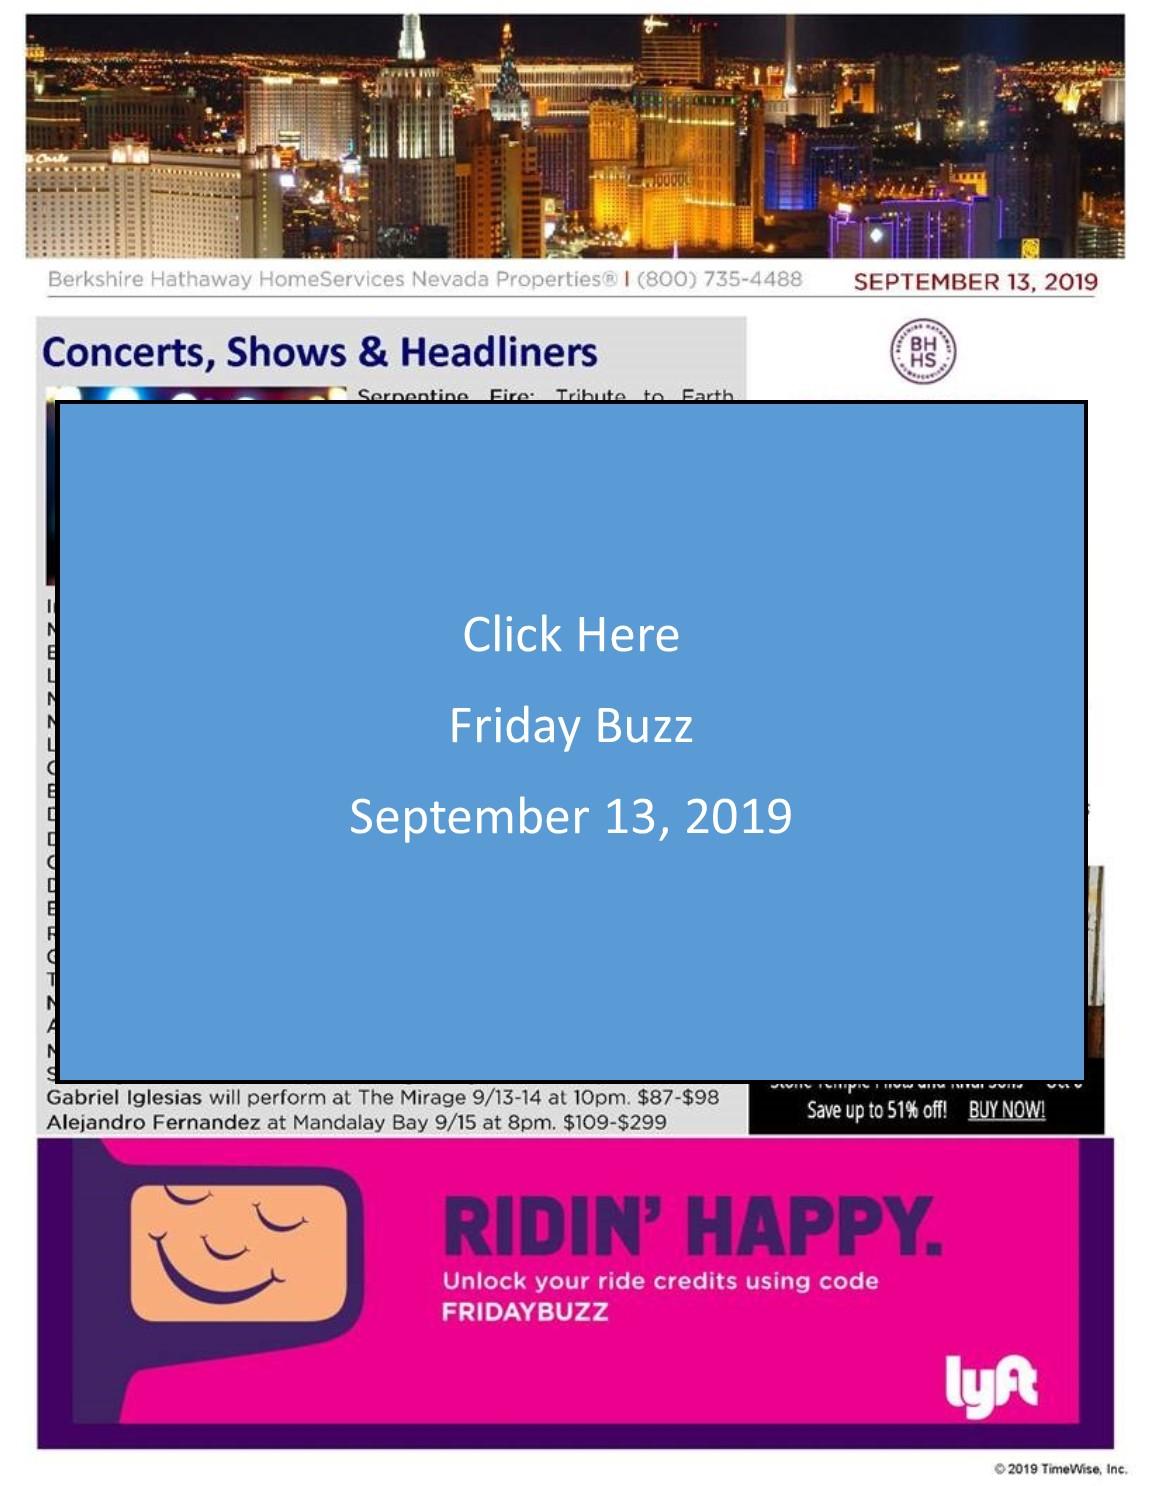 The Friday Buzz for September 13 2019 - LasVegasRealEstate.com